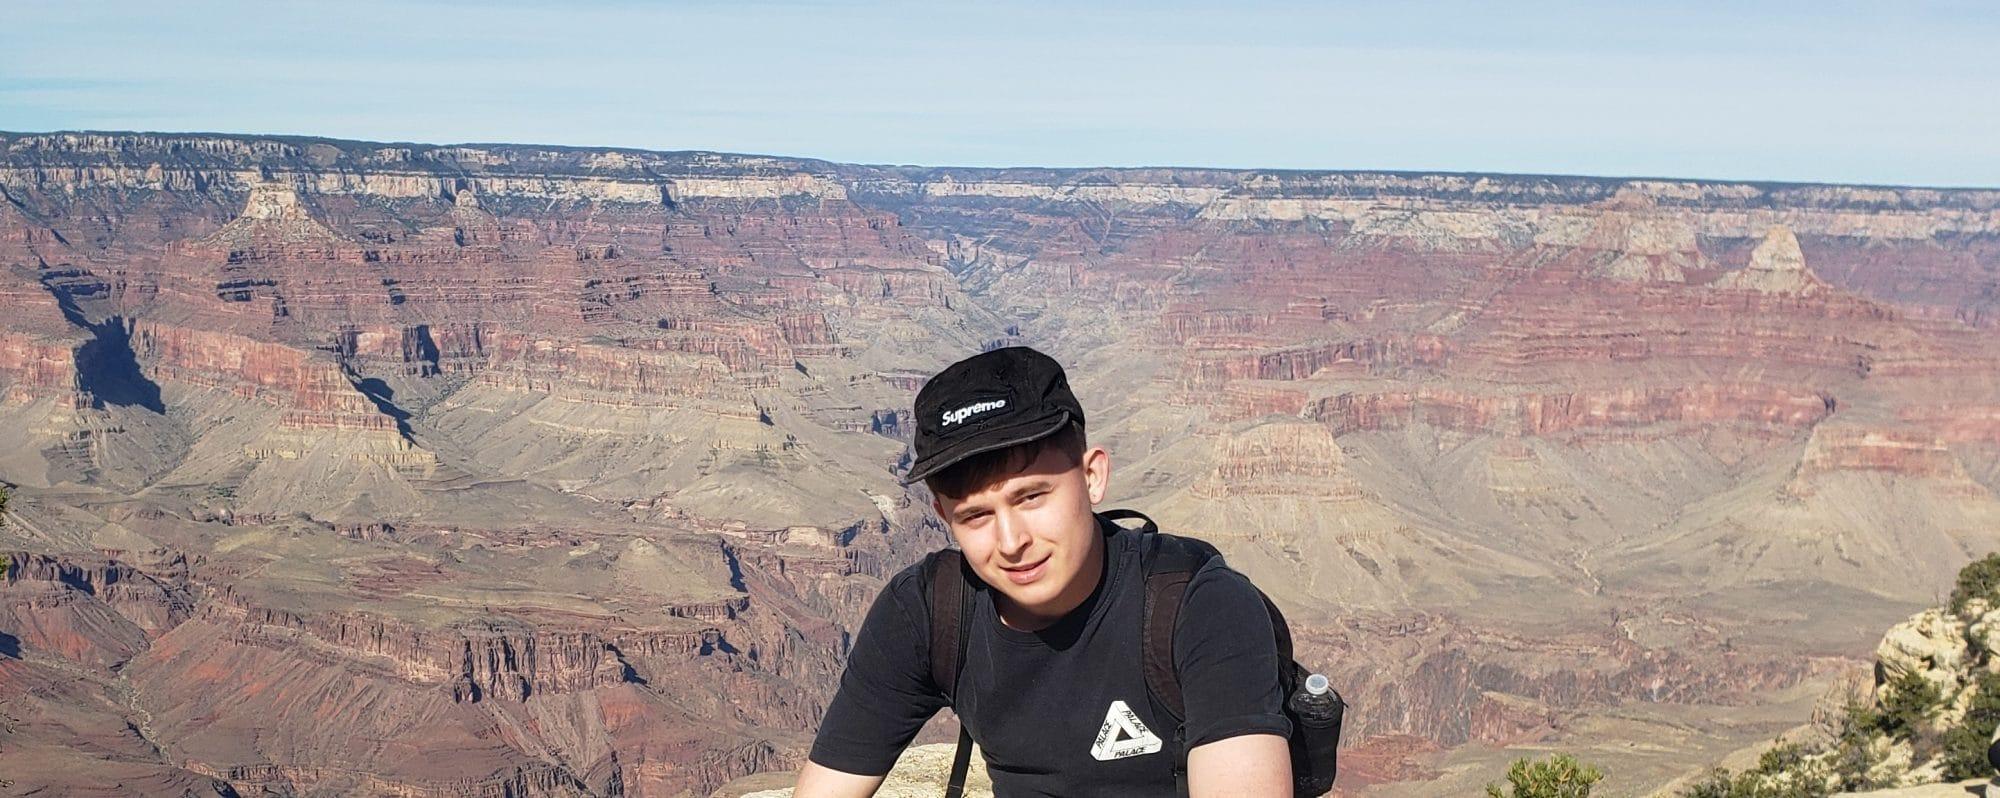 mark grand canyon